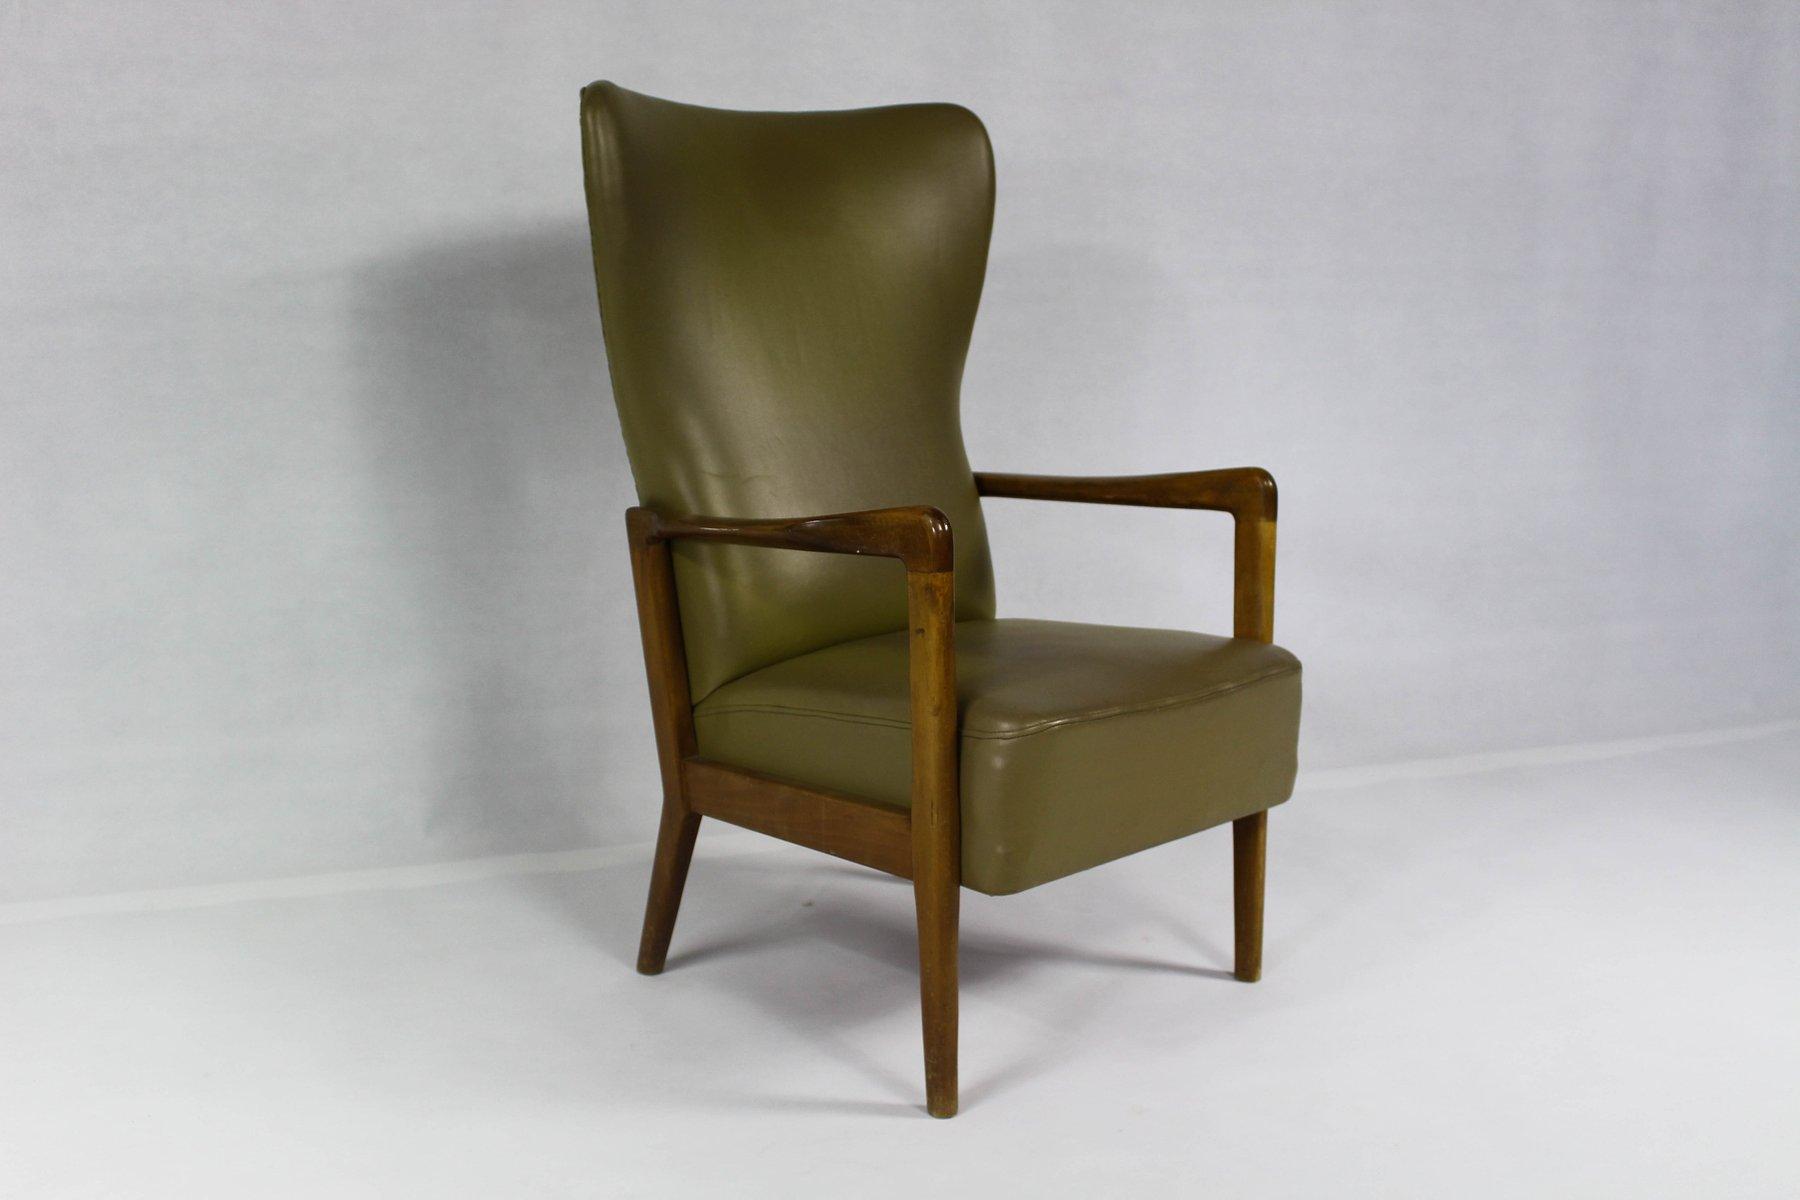 Vintage Danish Wing Chair by Soren Hansen for Fritz Hansen for